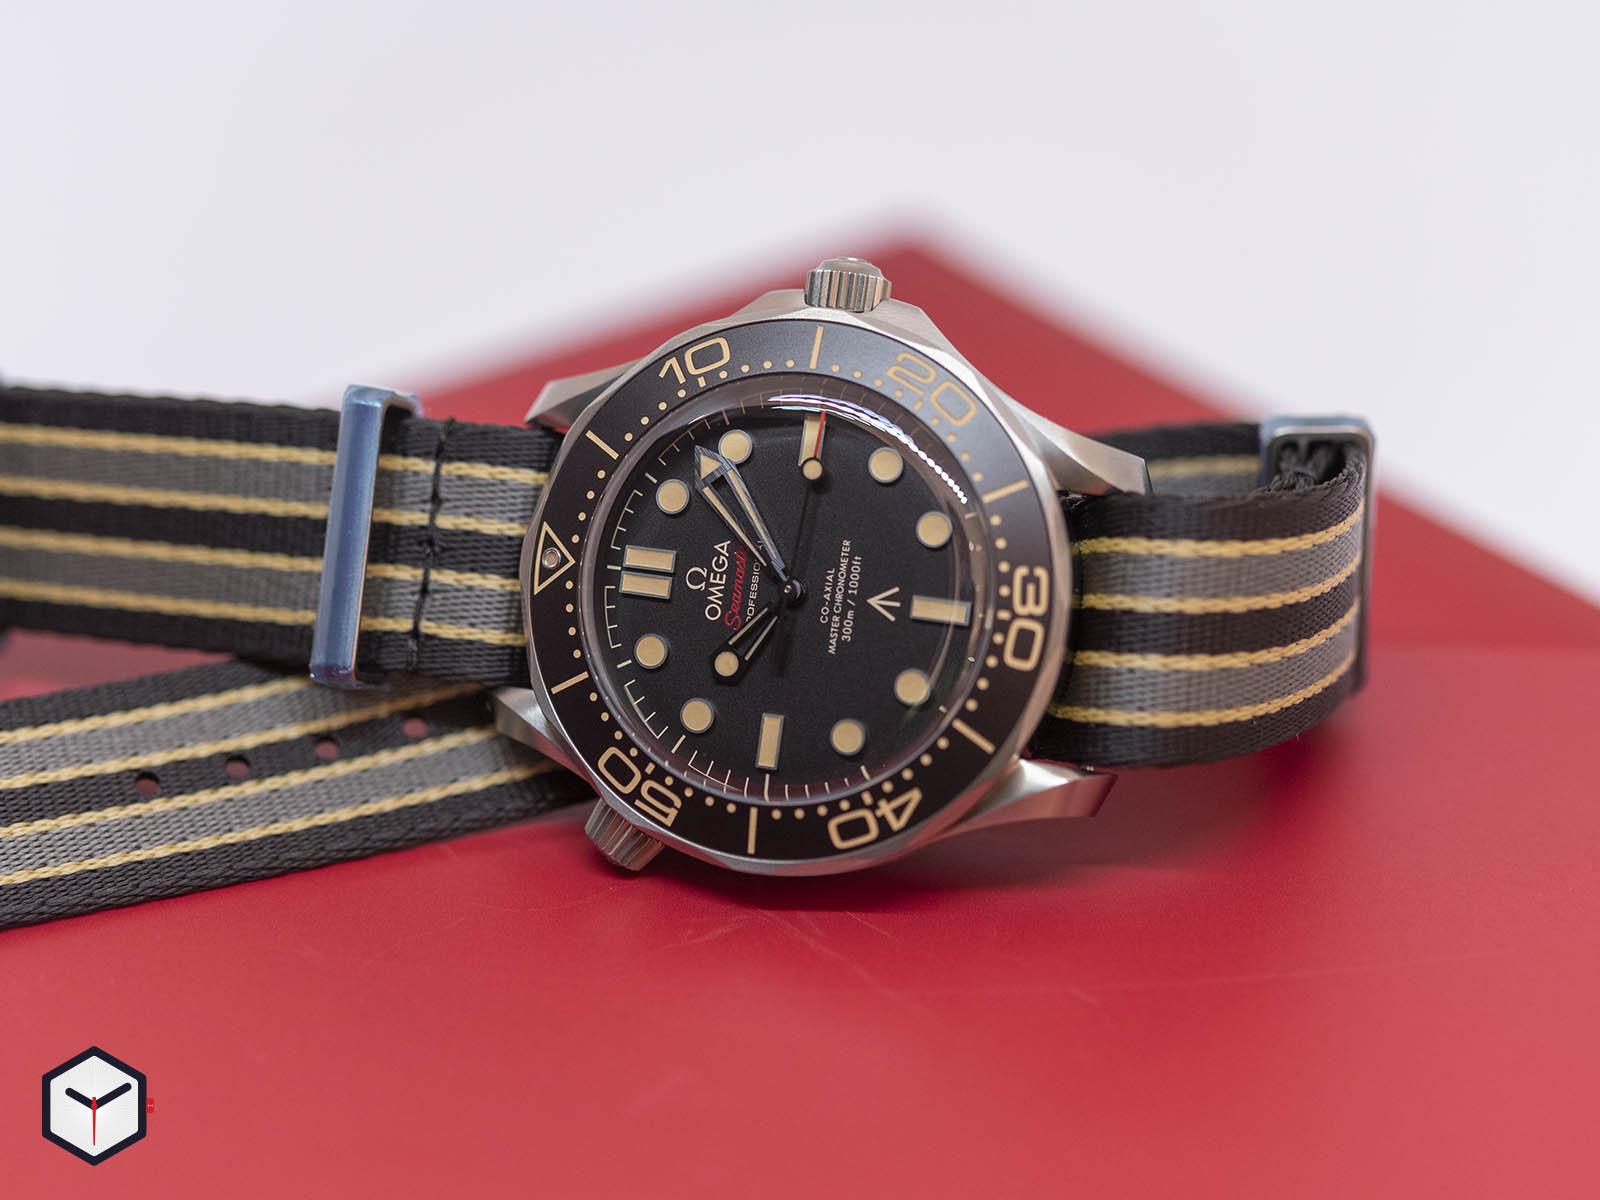 210-92-42-20-01-001-omega-seamaster-diver-300m-007-edition-1-.jpg